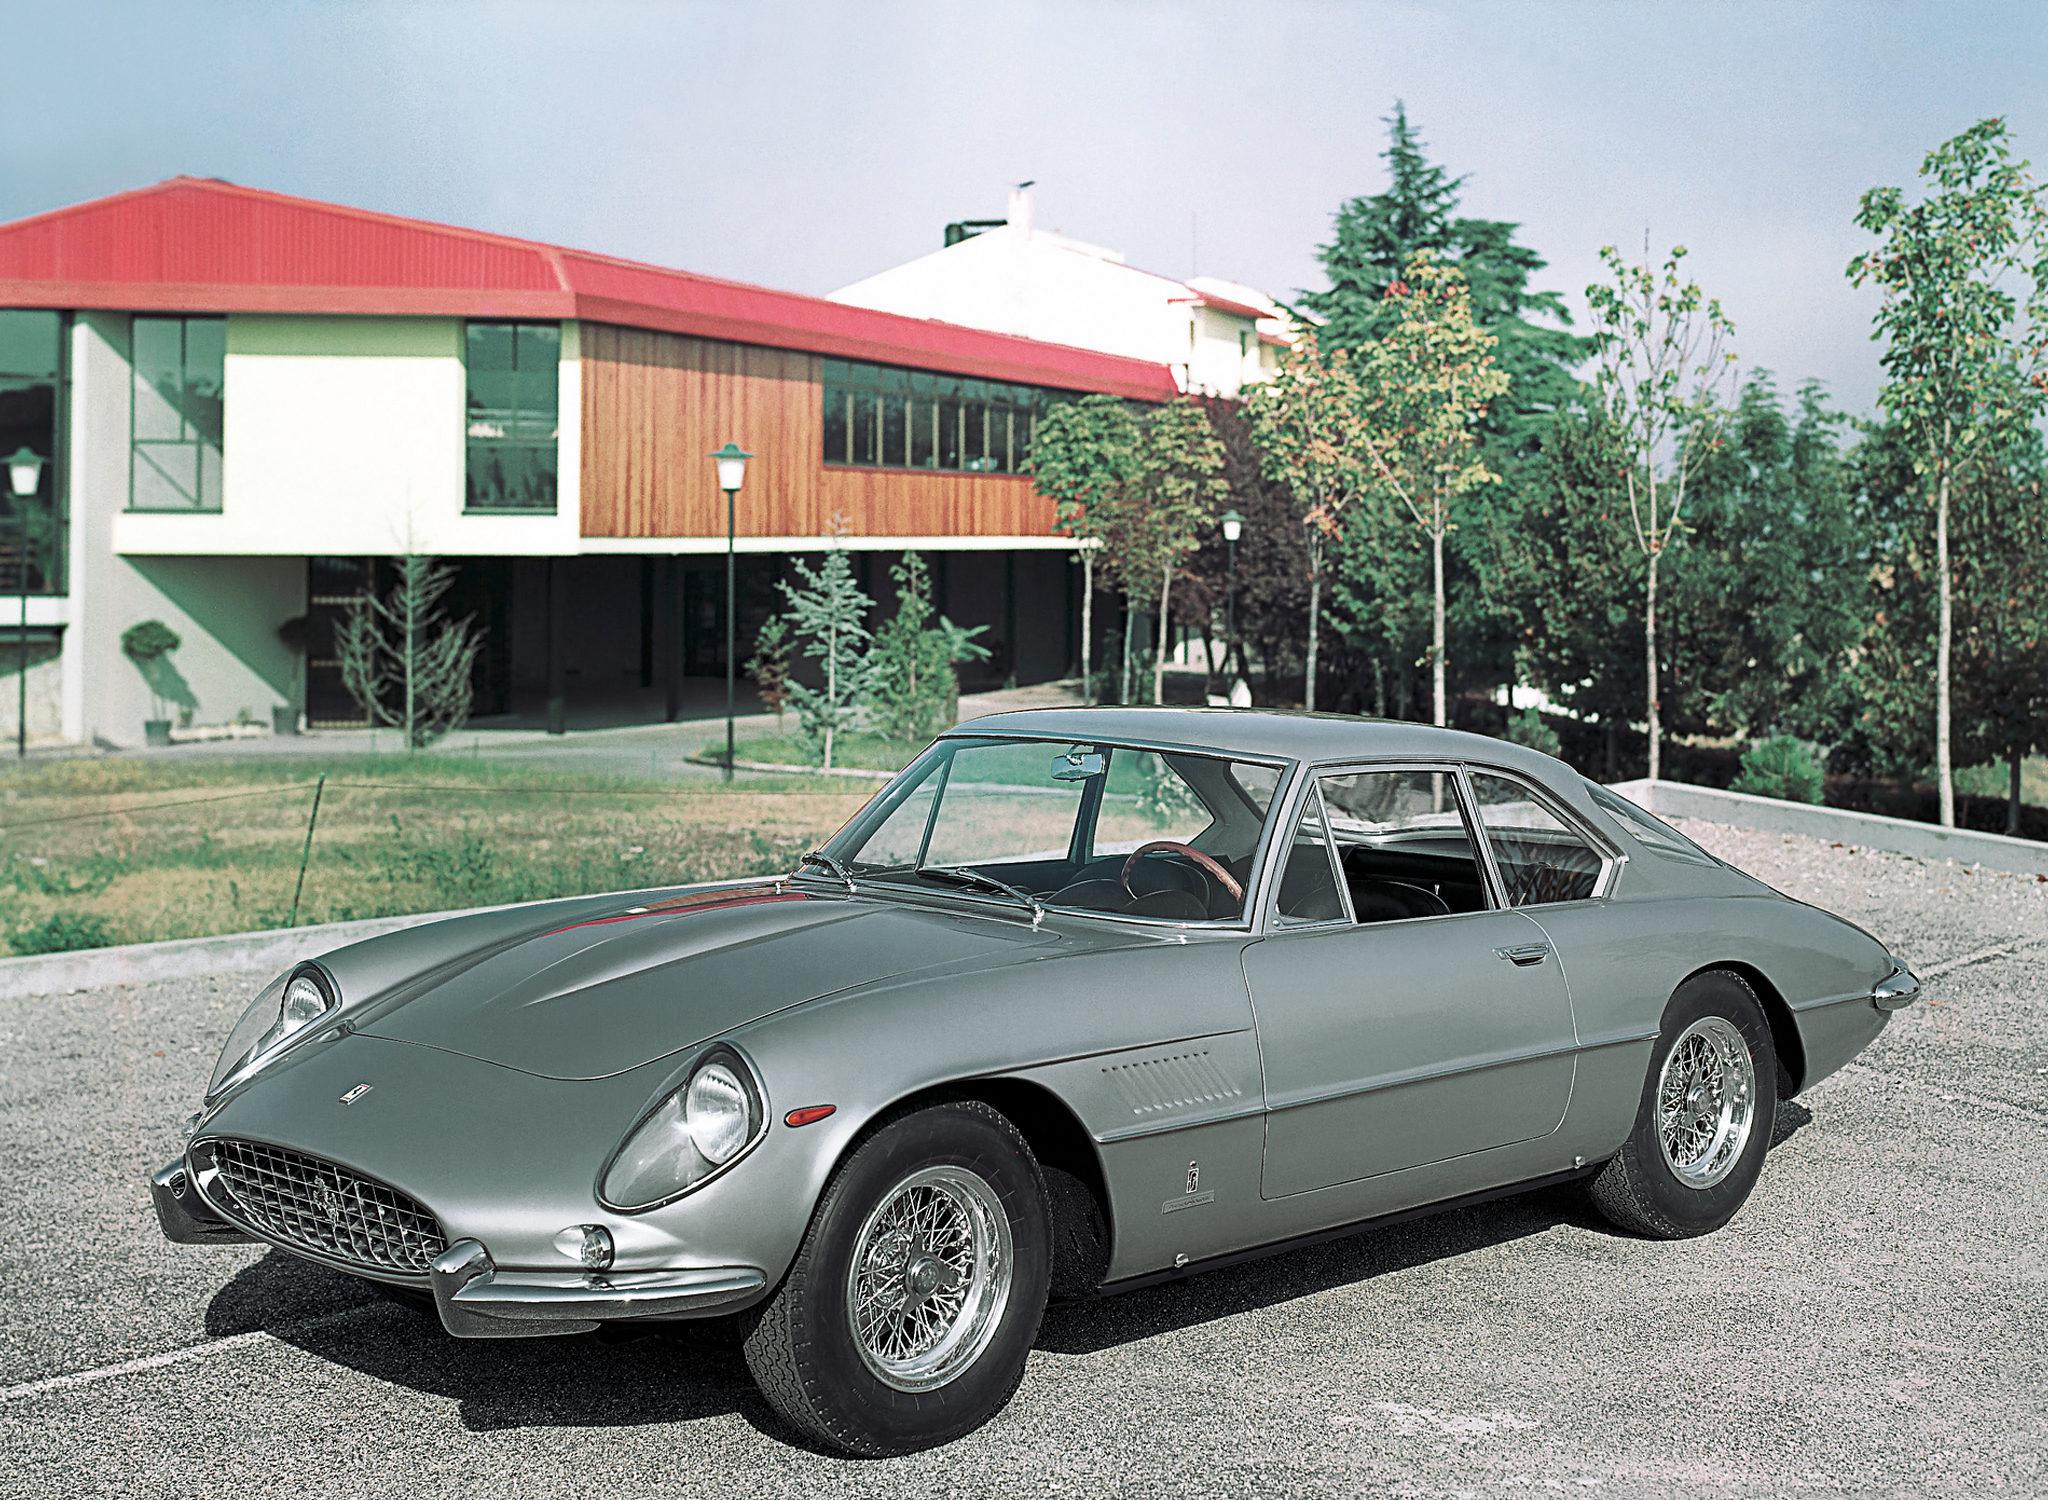 1962 Ferrari 400 Superamerica Coupe Aerodinamico